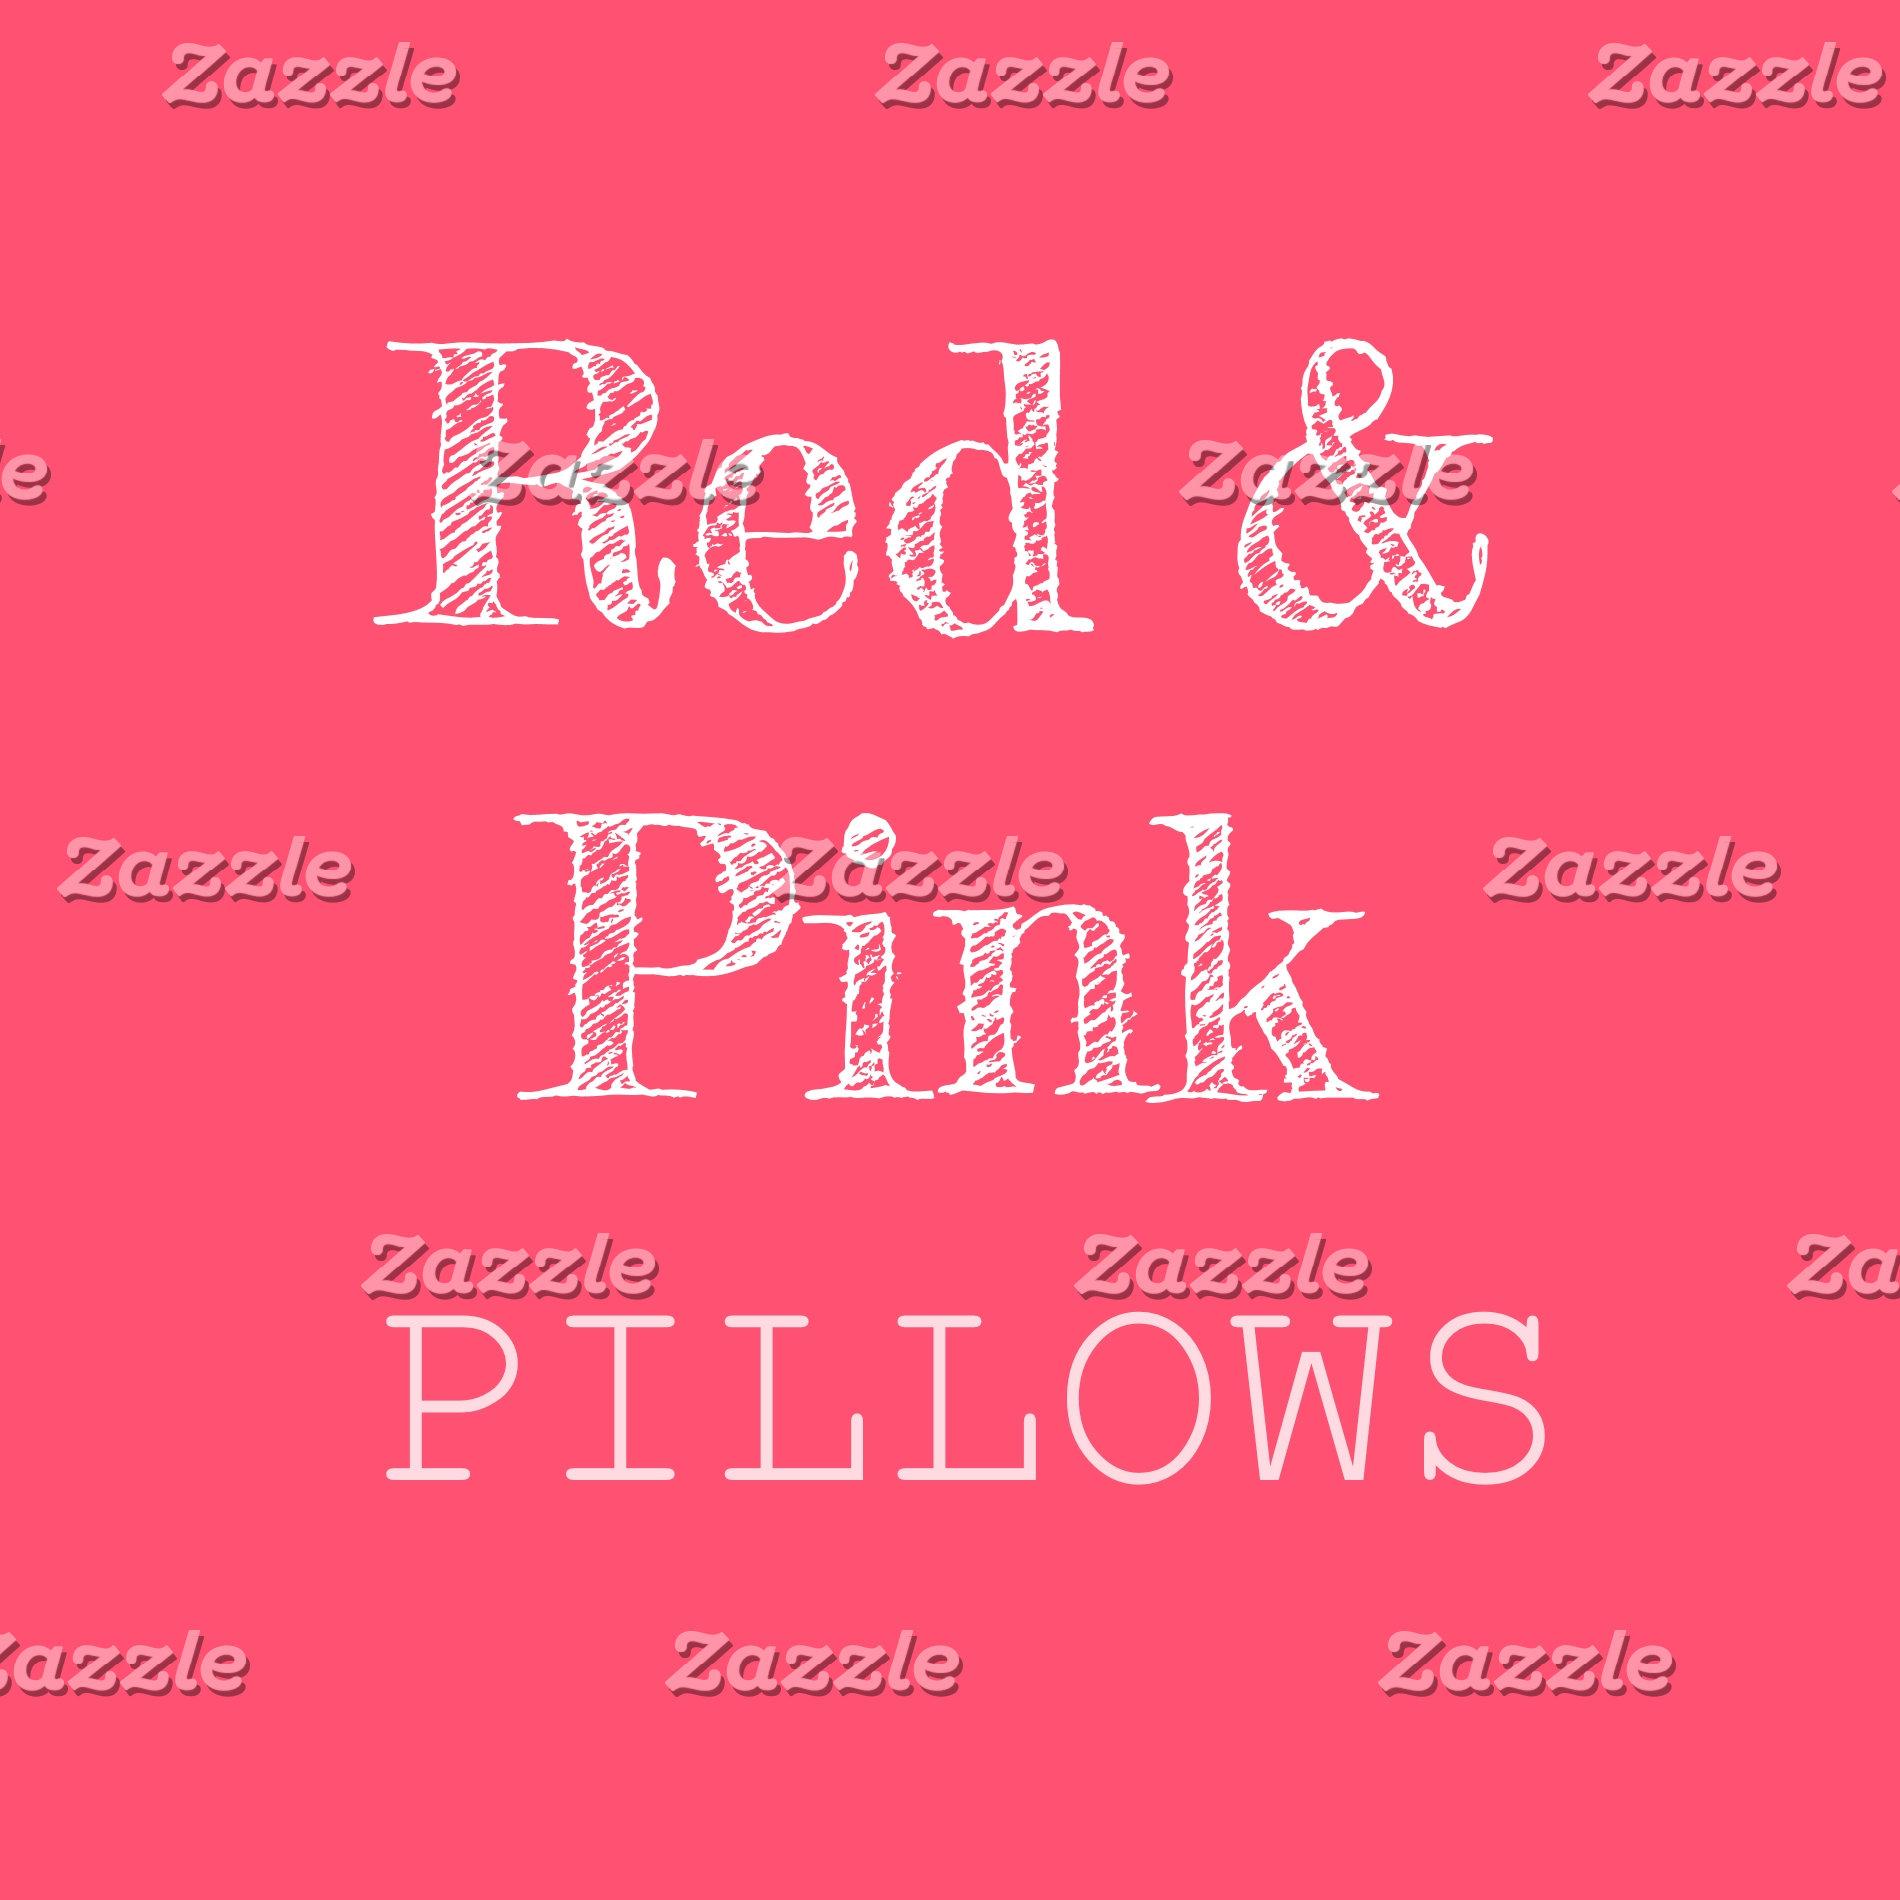 Red & Pink Pillows